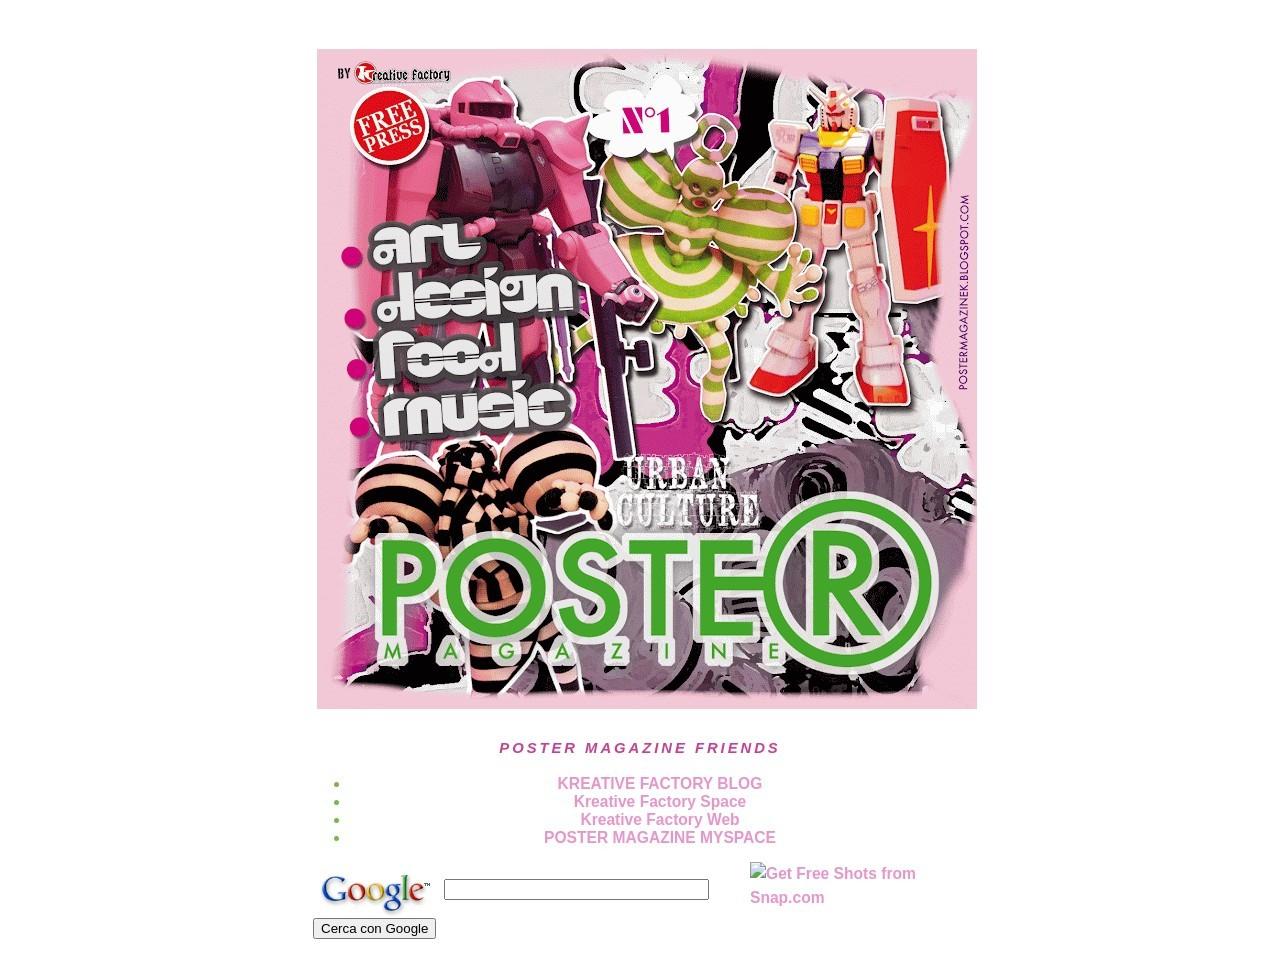 poster-magazine